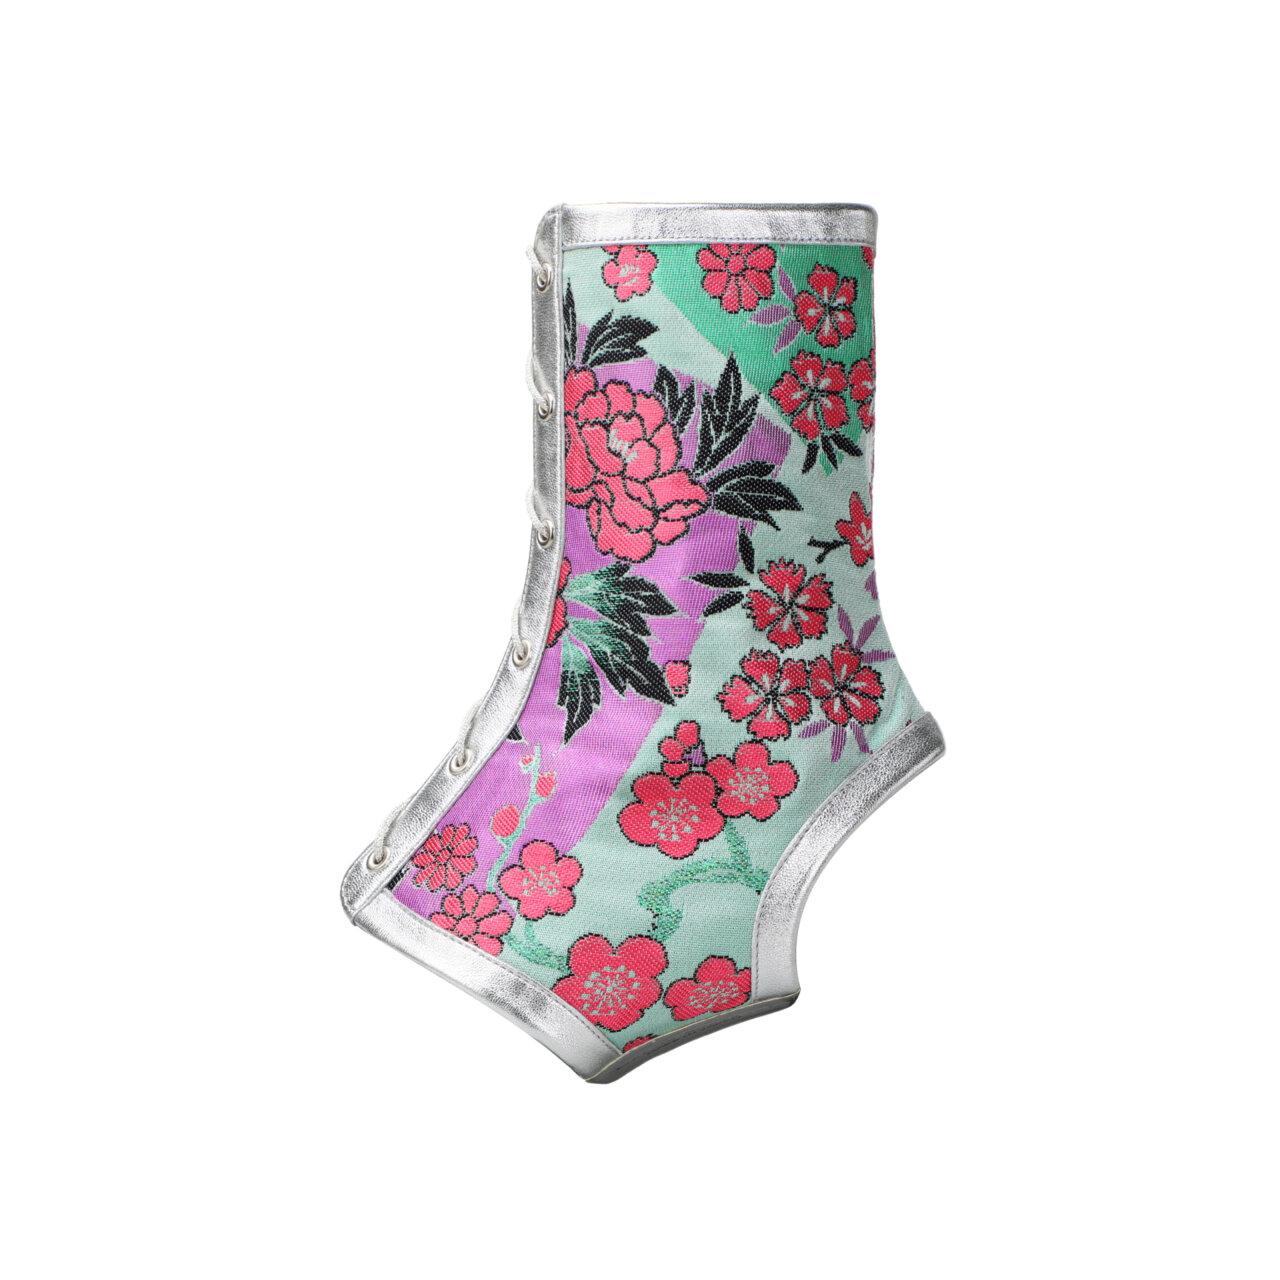 『Obi de Boots 粋』花雅〜Hanamiyabi〜(ブーツカバーのみ)の画像